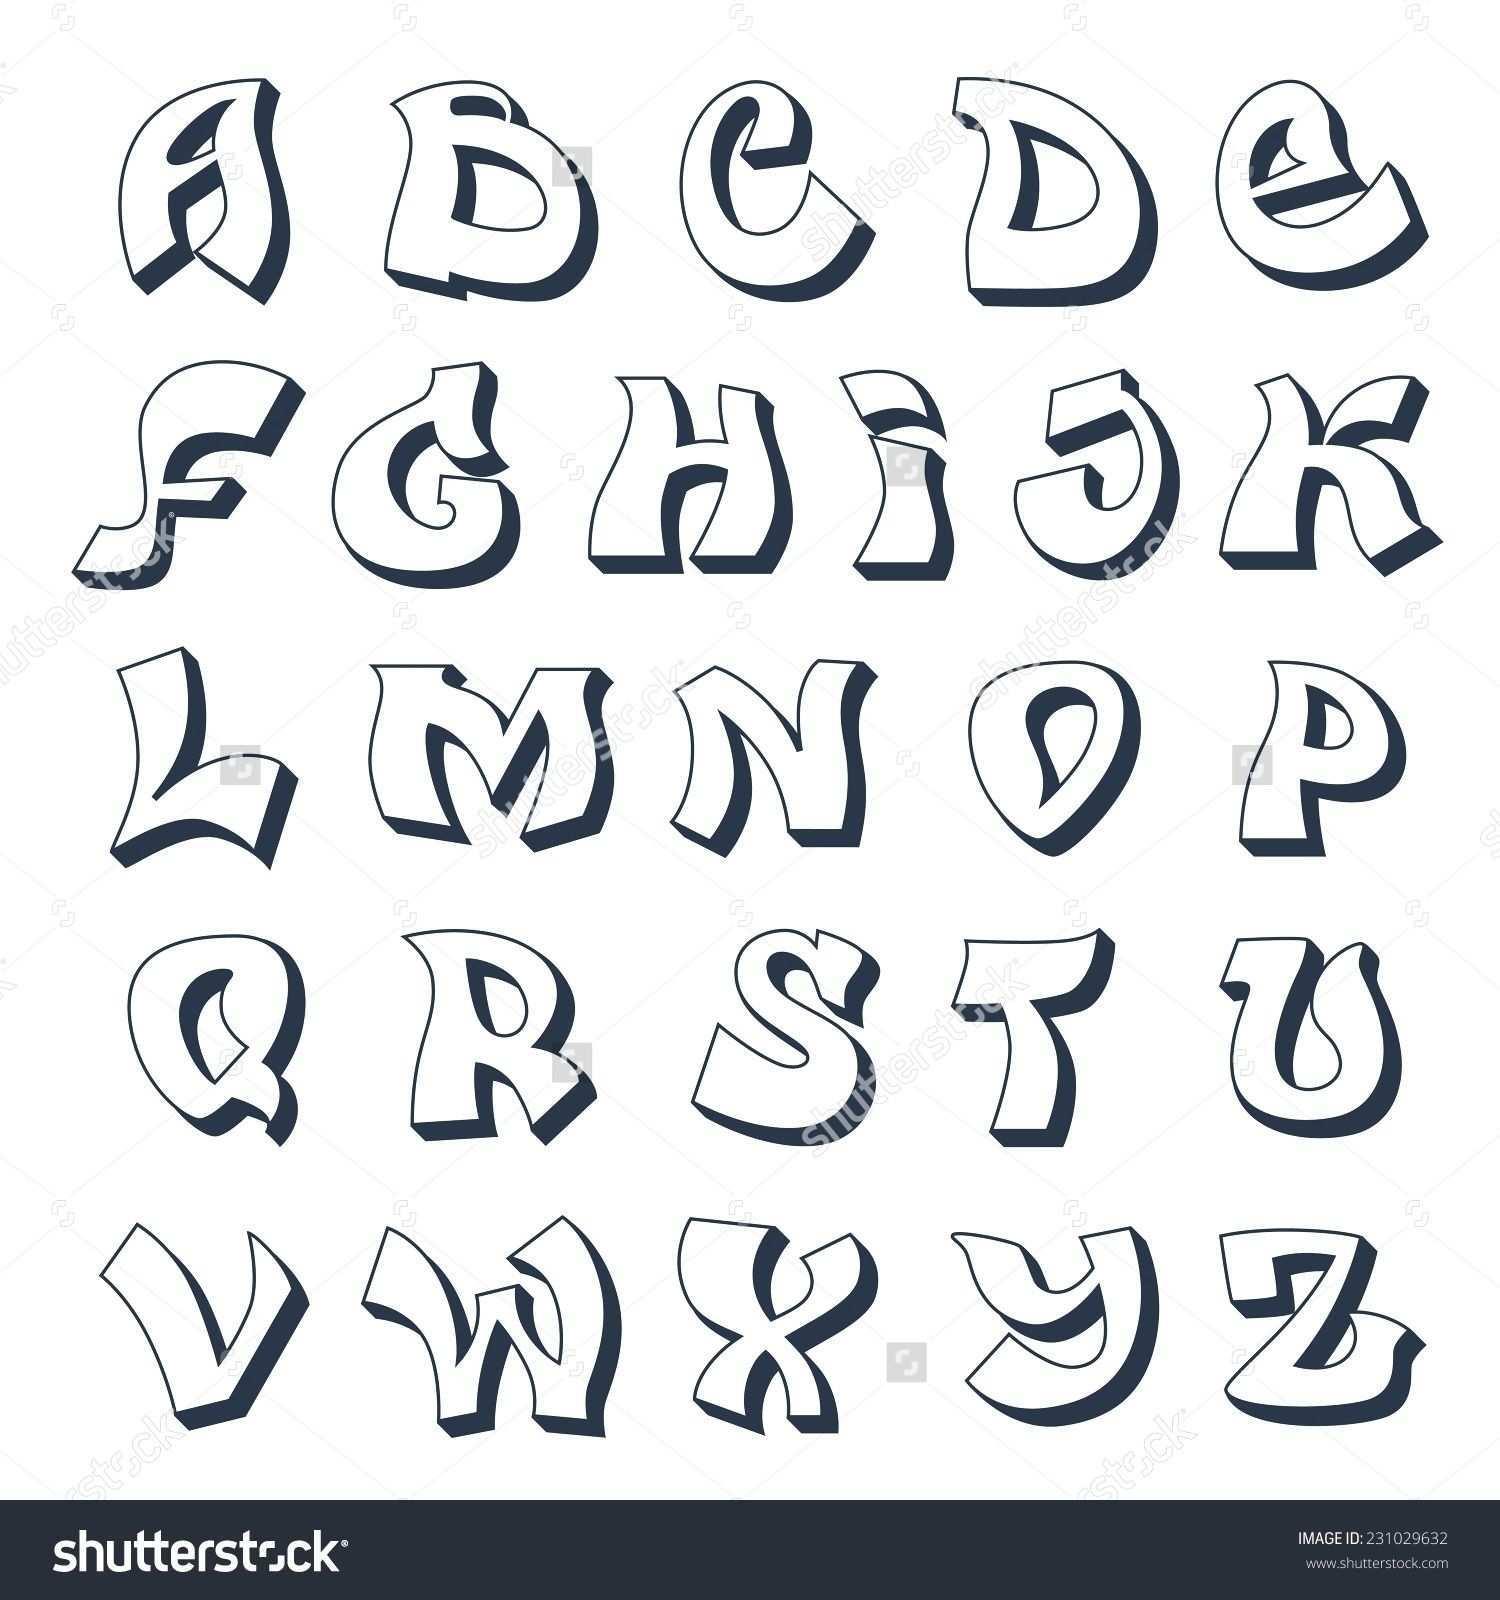 Graffiti Abc Vorlagen Graffiti Alphabet Cool Street Style Font In Graffiti Buchstaben Vorlagen A Z Font Di Scrittura Lettere Calligrafia Scrittura